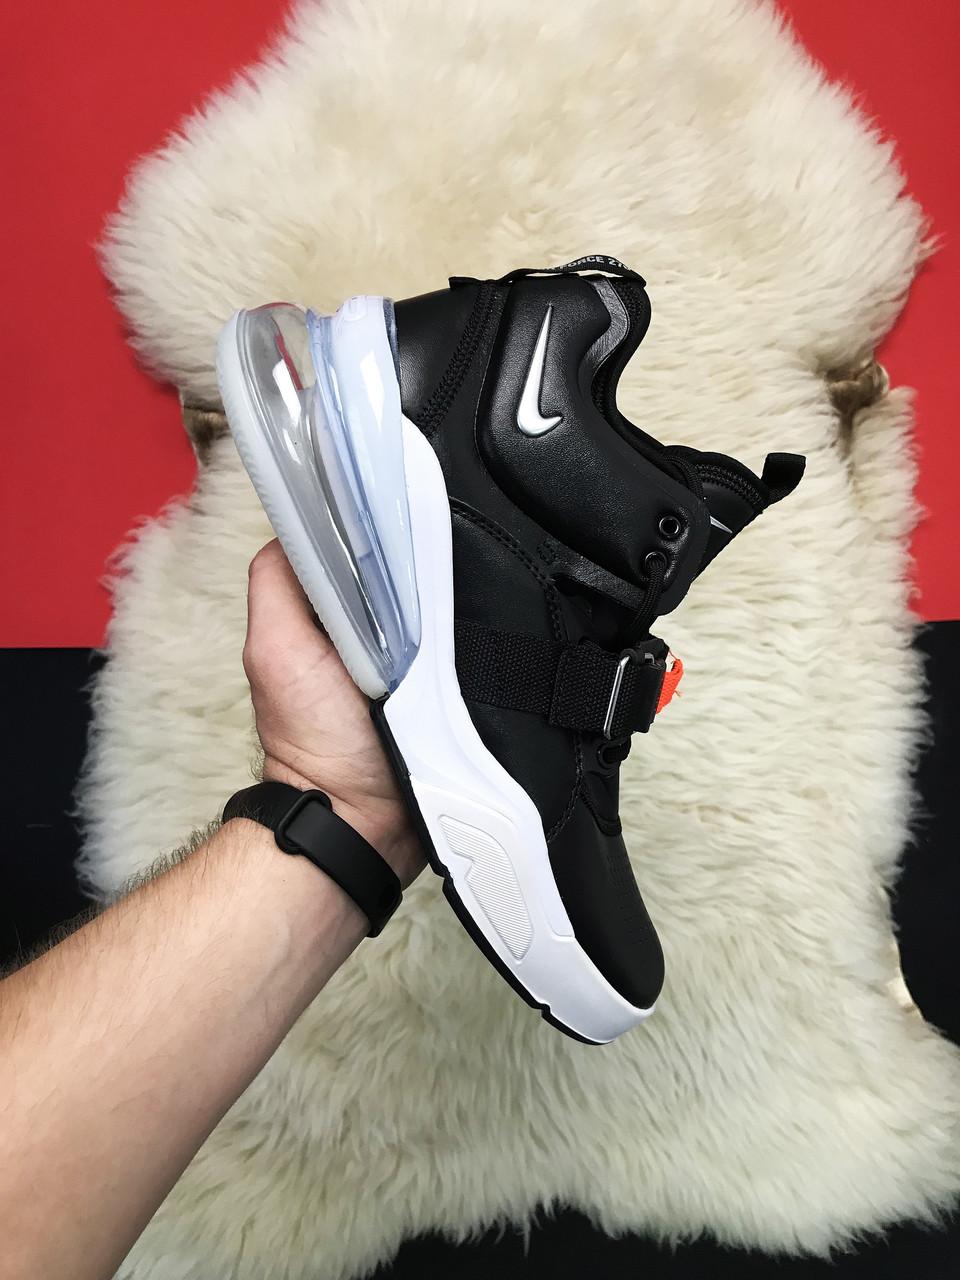 Мужские кроссовки Nike Air Force 270, мужские кроссовки найк аир форс 270